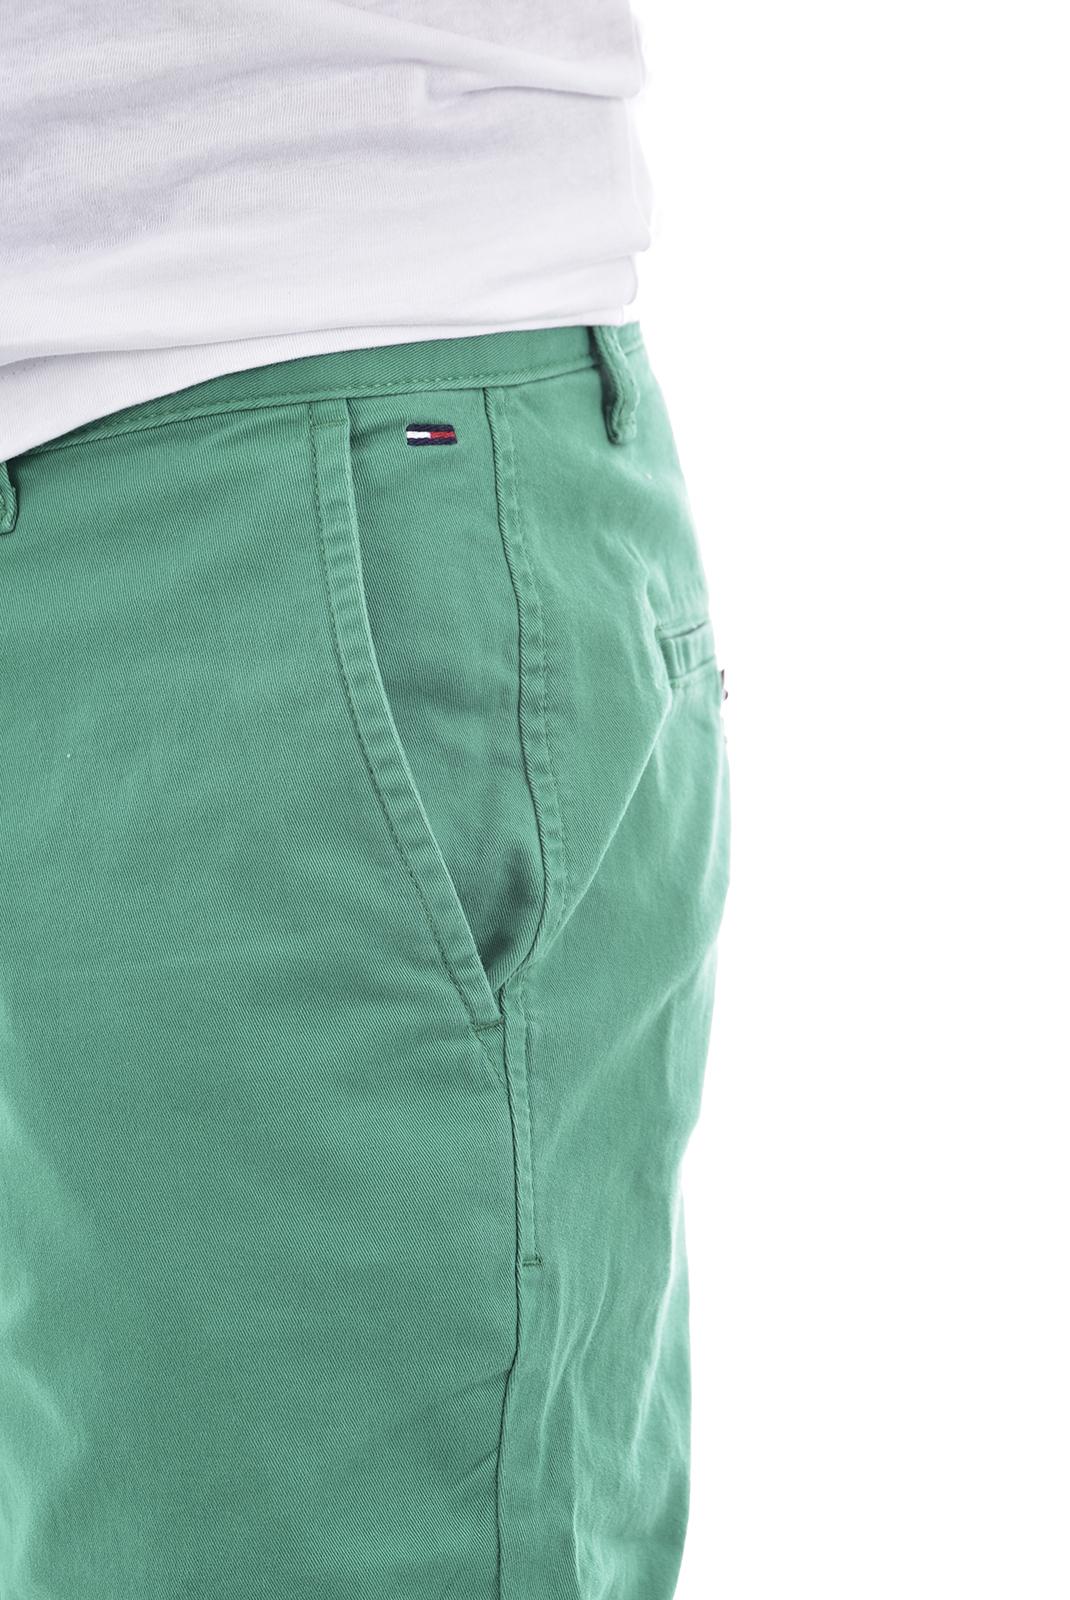 Shorts & Bermudas  Tommy Jeans DM0DM01928391 391 JELLY BEAN